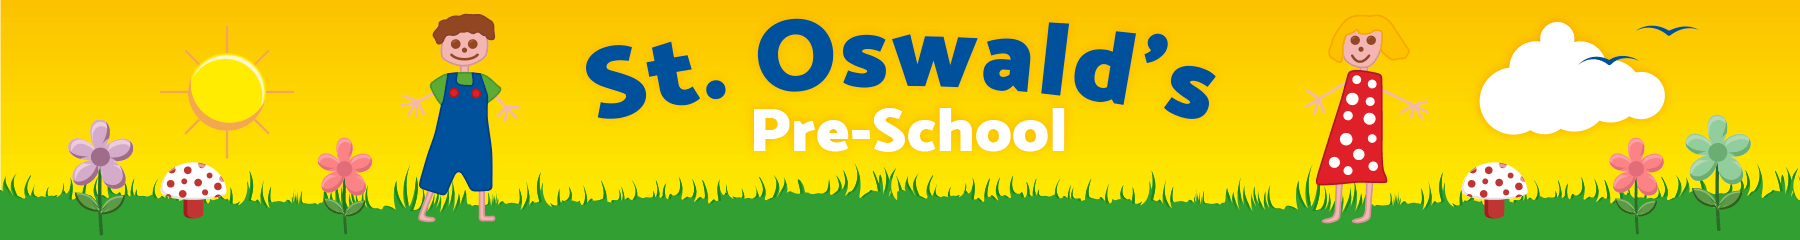 St. Oswalds Pre-School